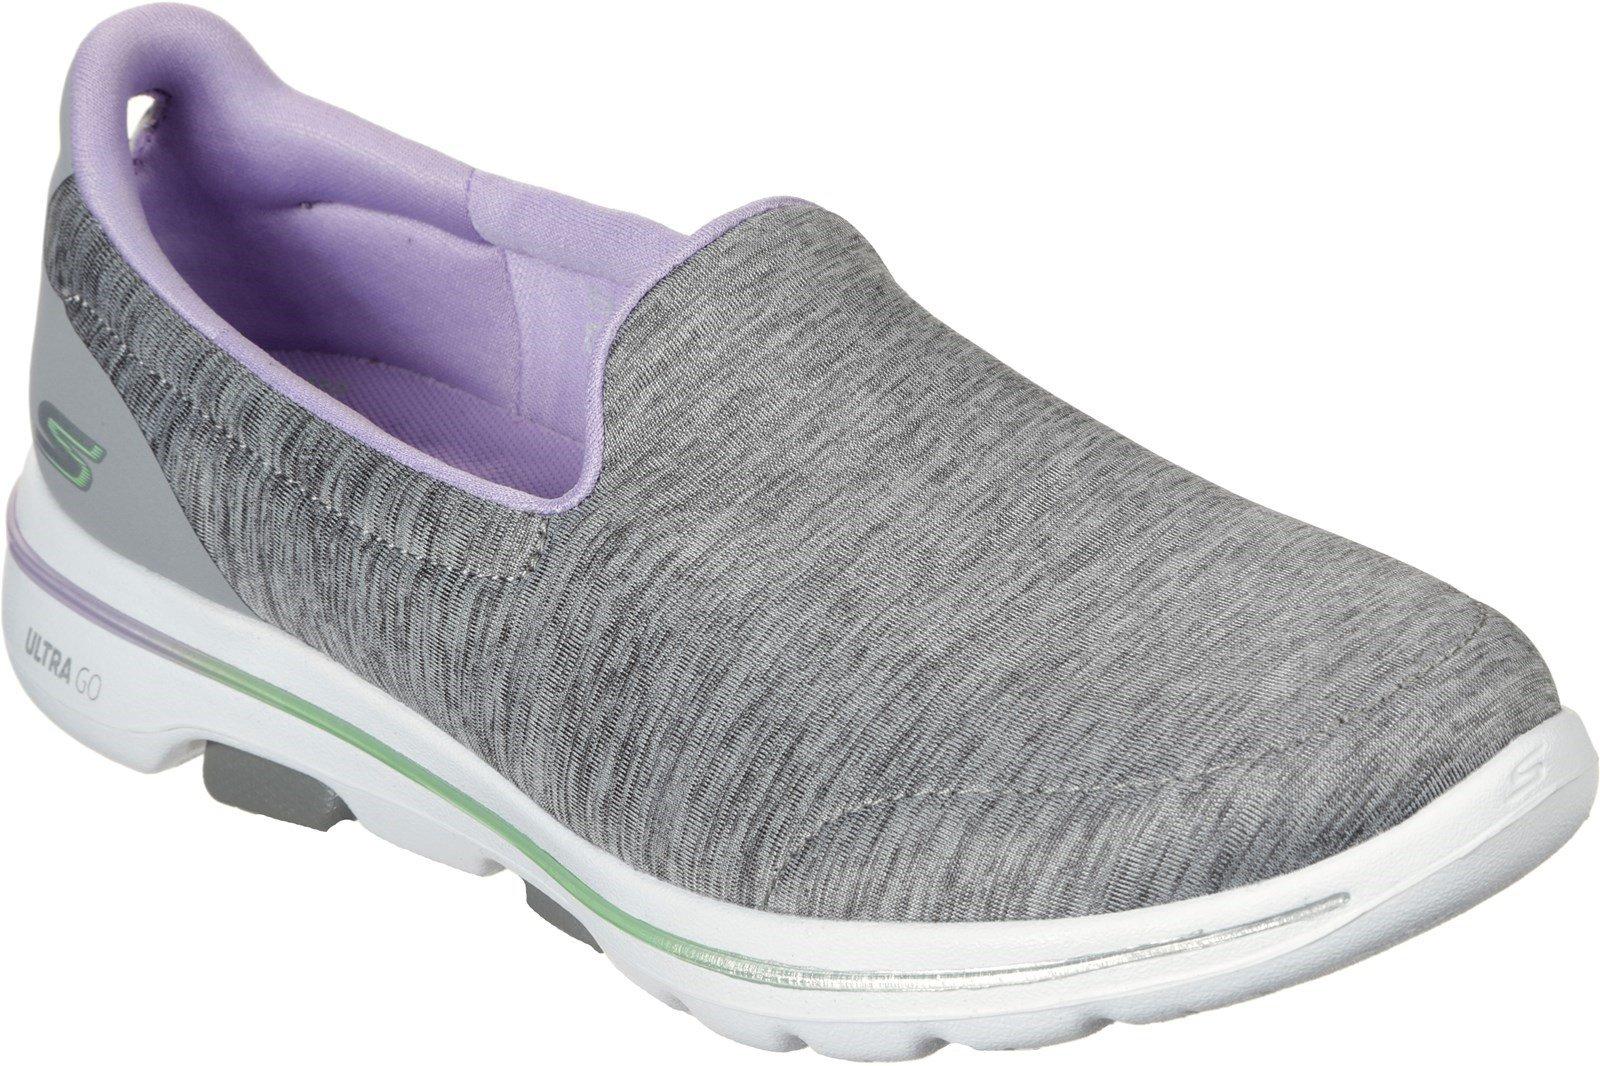 Skechers Women's GOwalk 5 Surprise Slip On Trainer Multicolor 31030 - Grey/Lavender 3